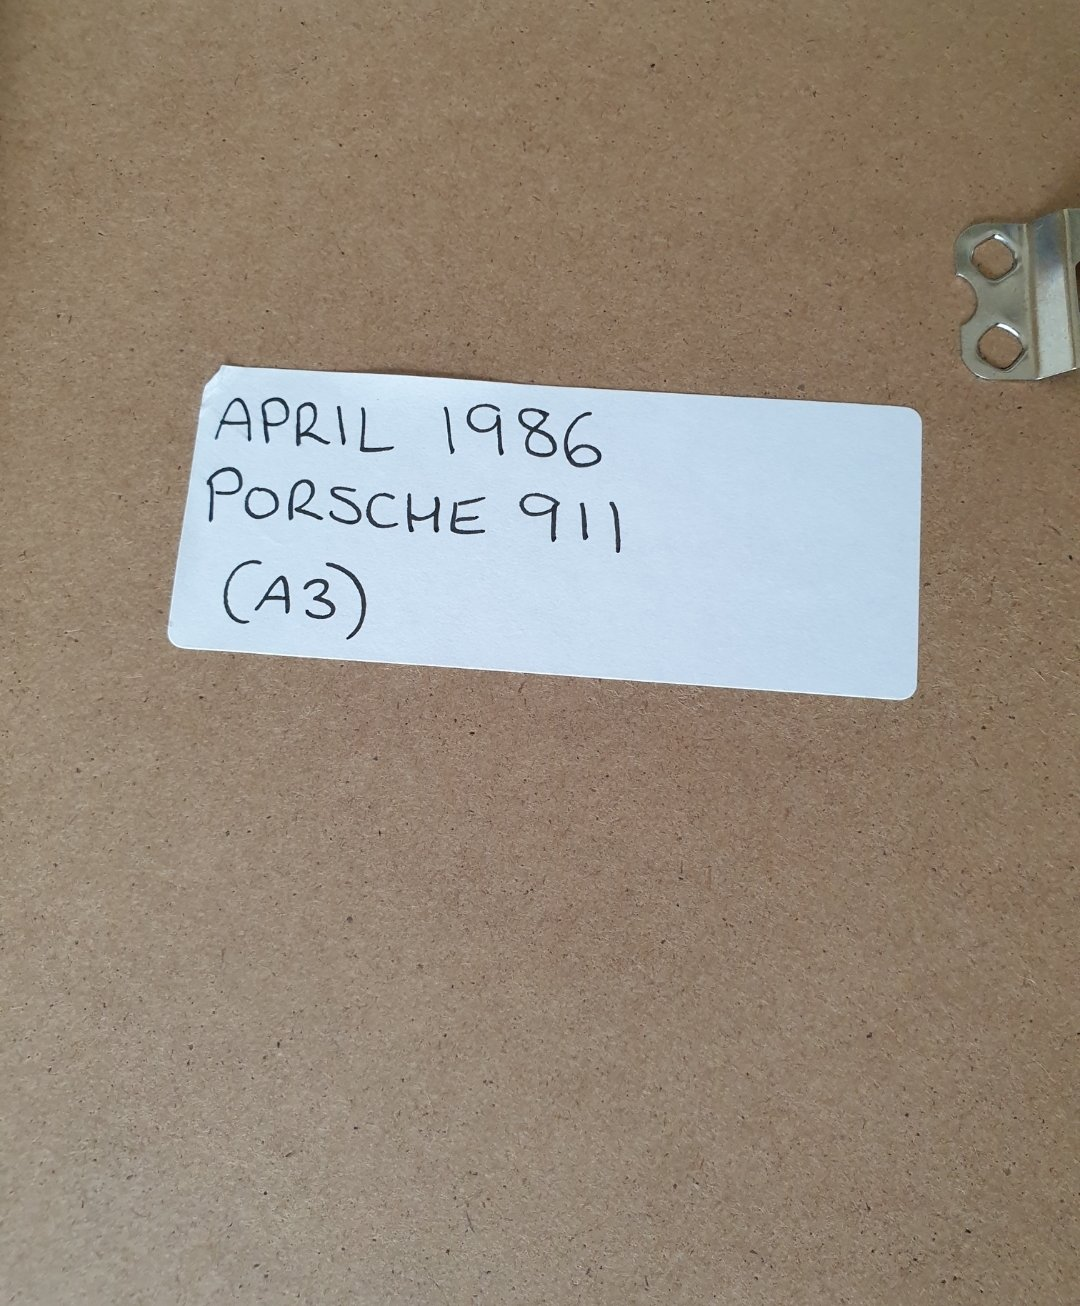 1986 Porsche 911 Advert Original  For Sale (picture 2 of 2)